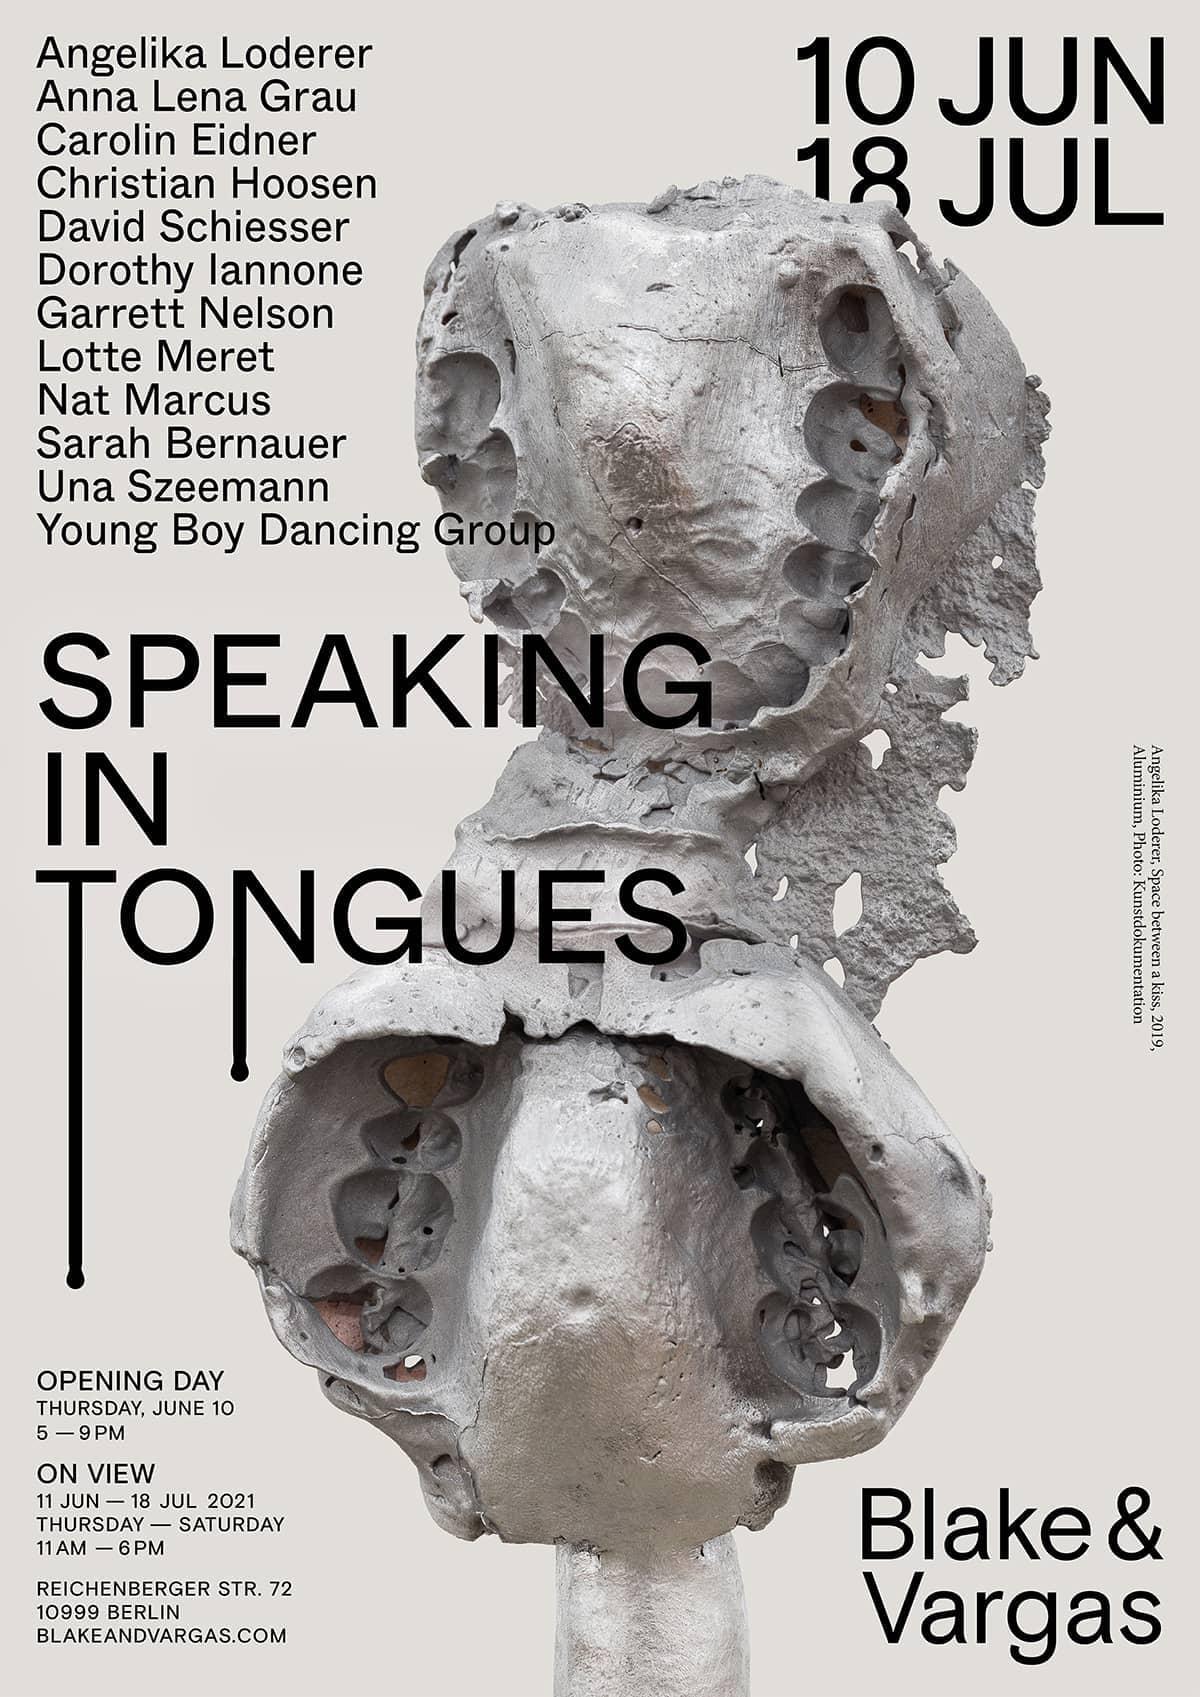 Speaking in Tongues at Blake and Vargas Studio Matthias Last 7